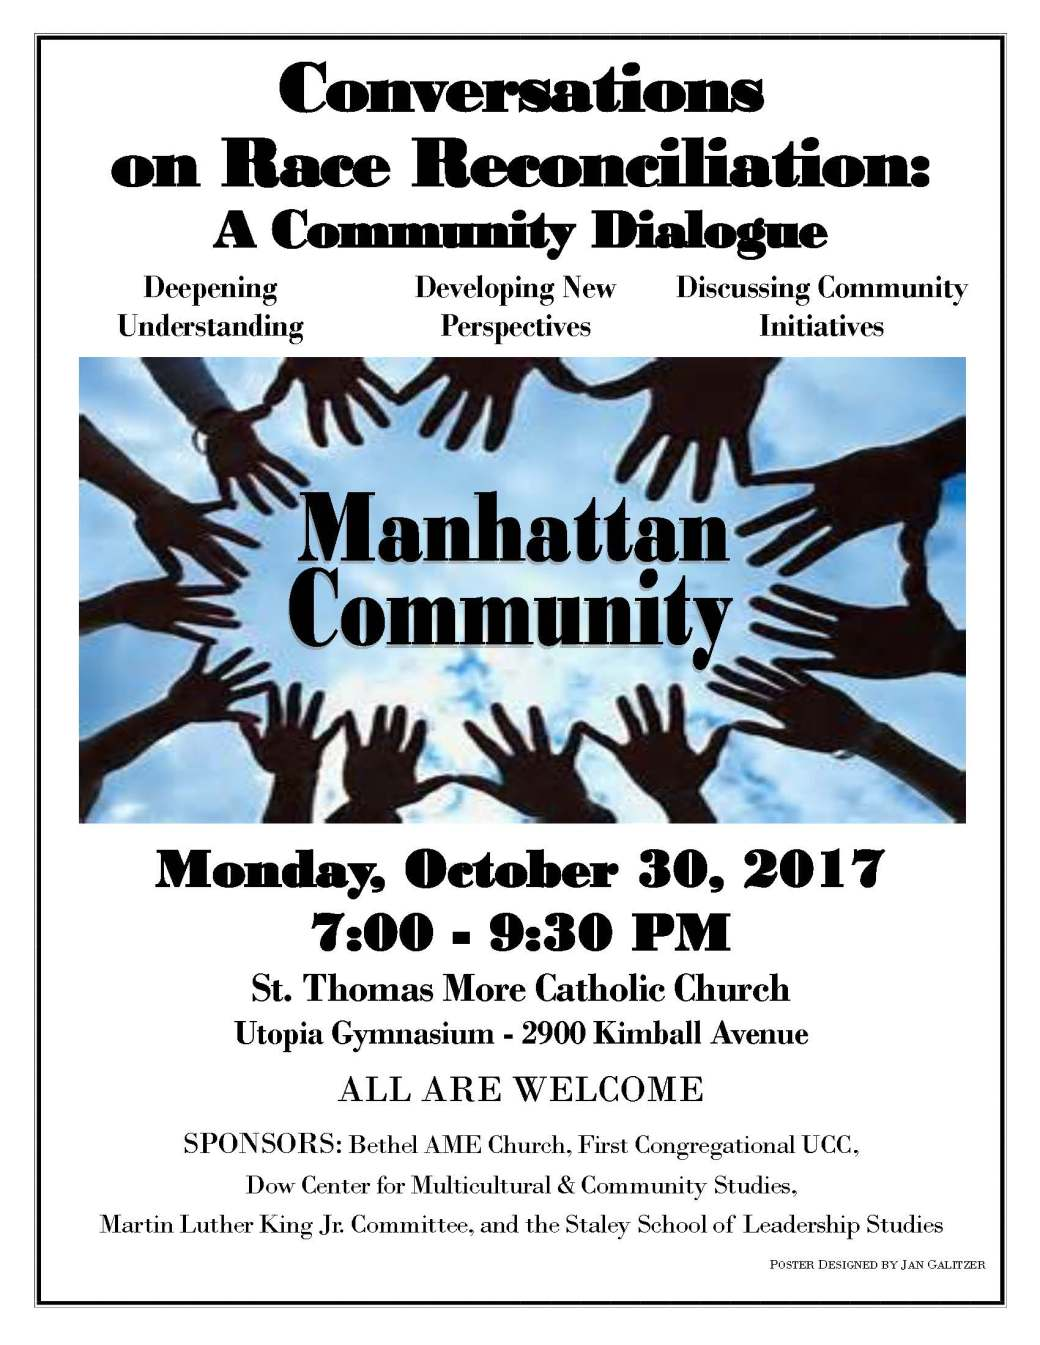 MHK Race Reconcilation Poster